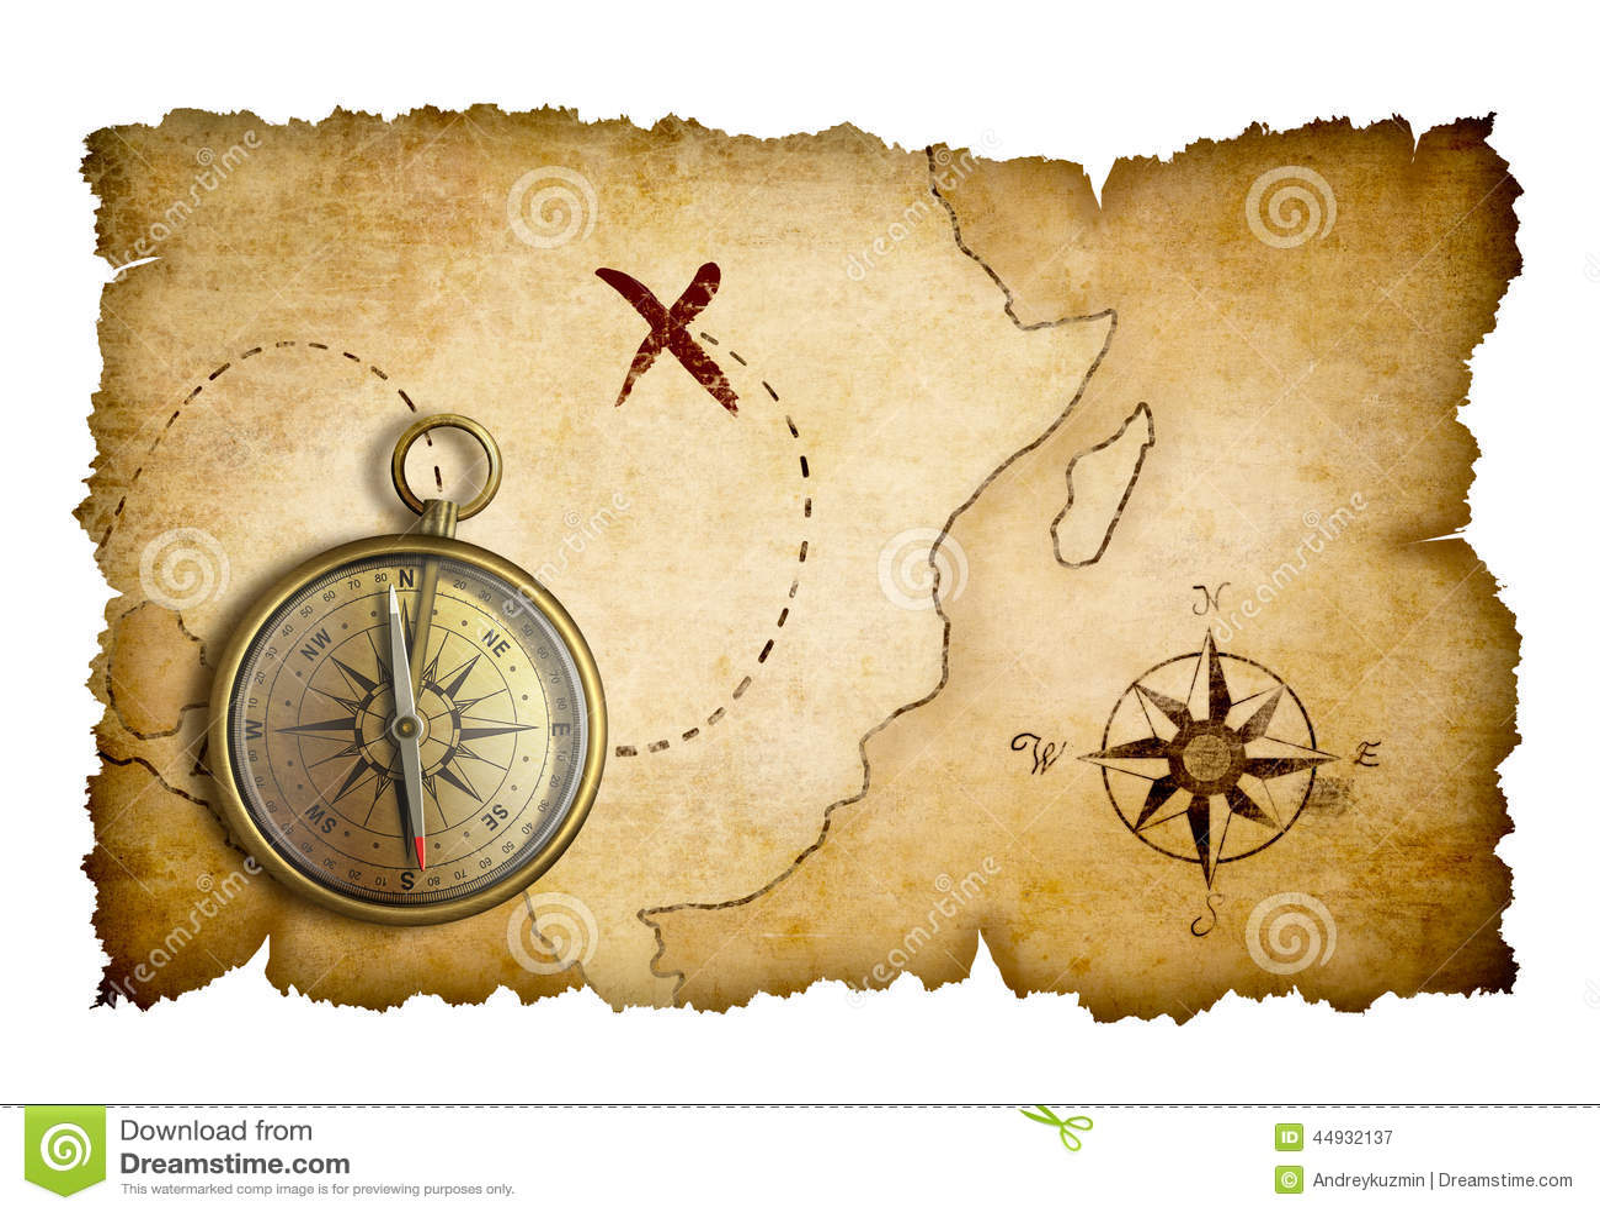 ... mapa del tesoro ile ilgili ...